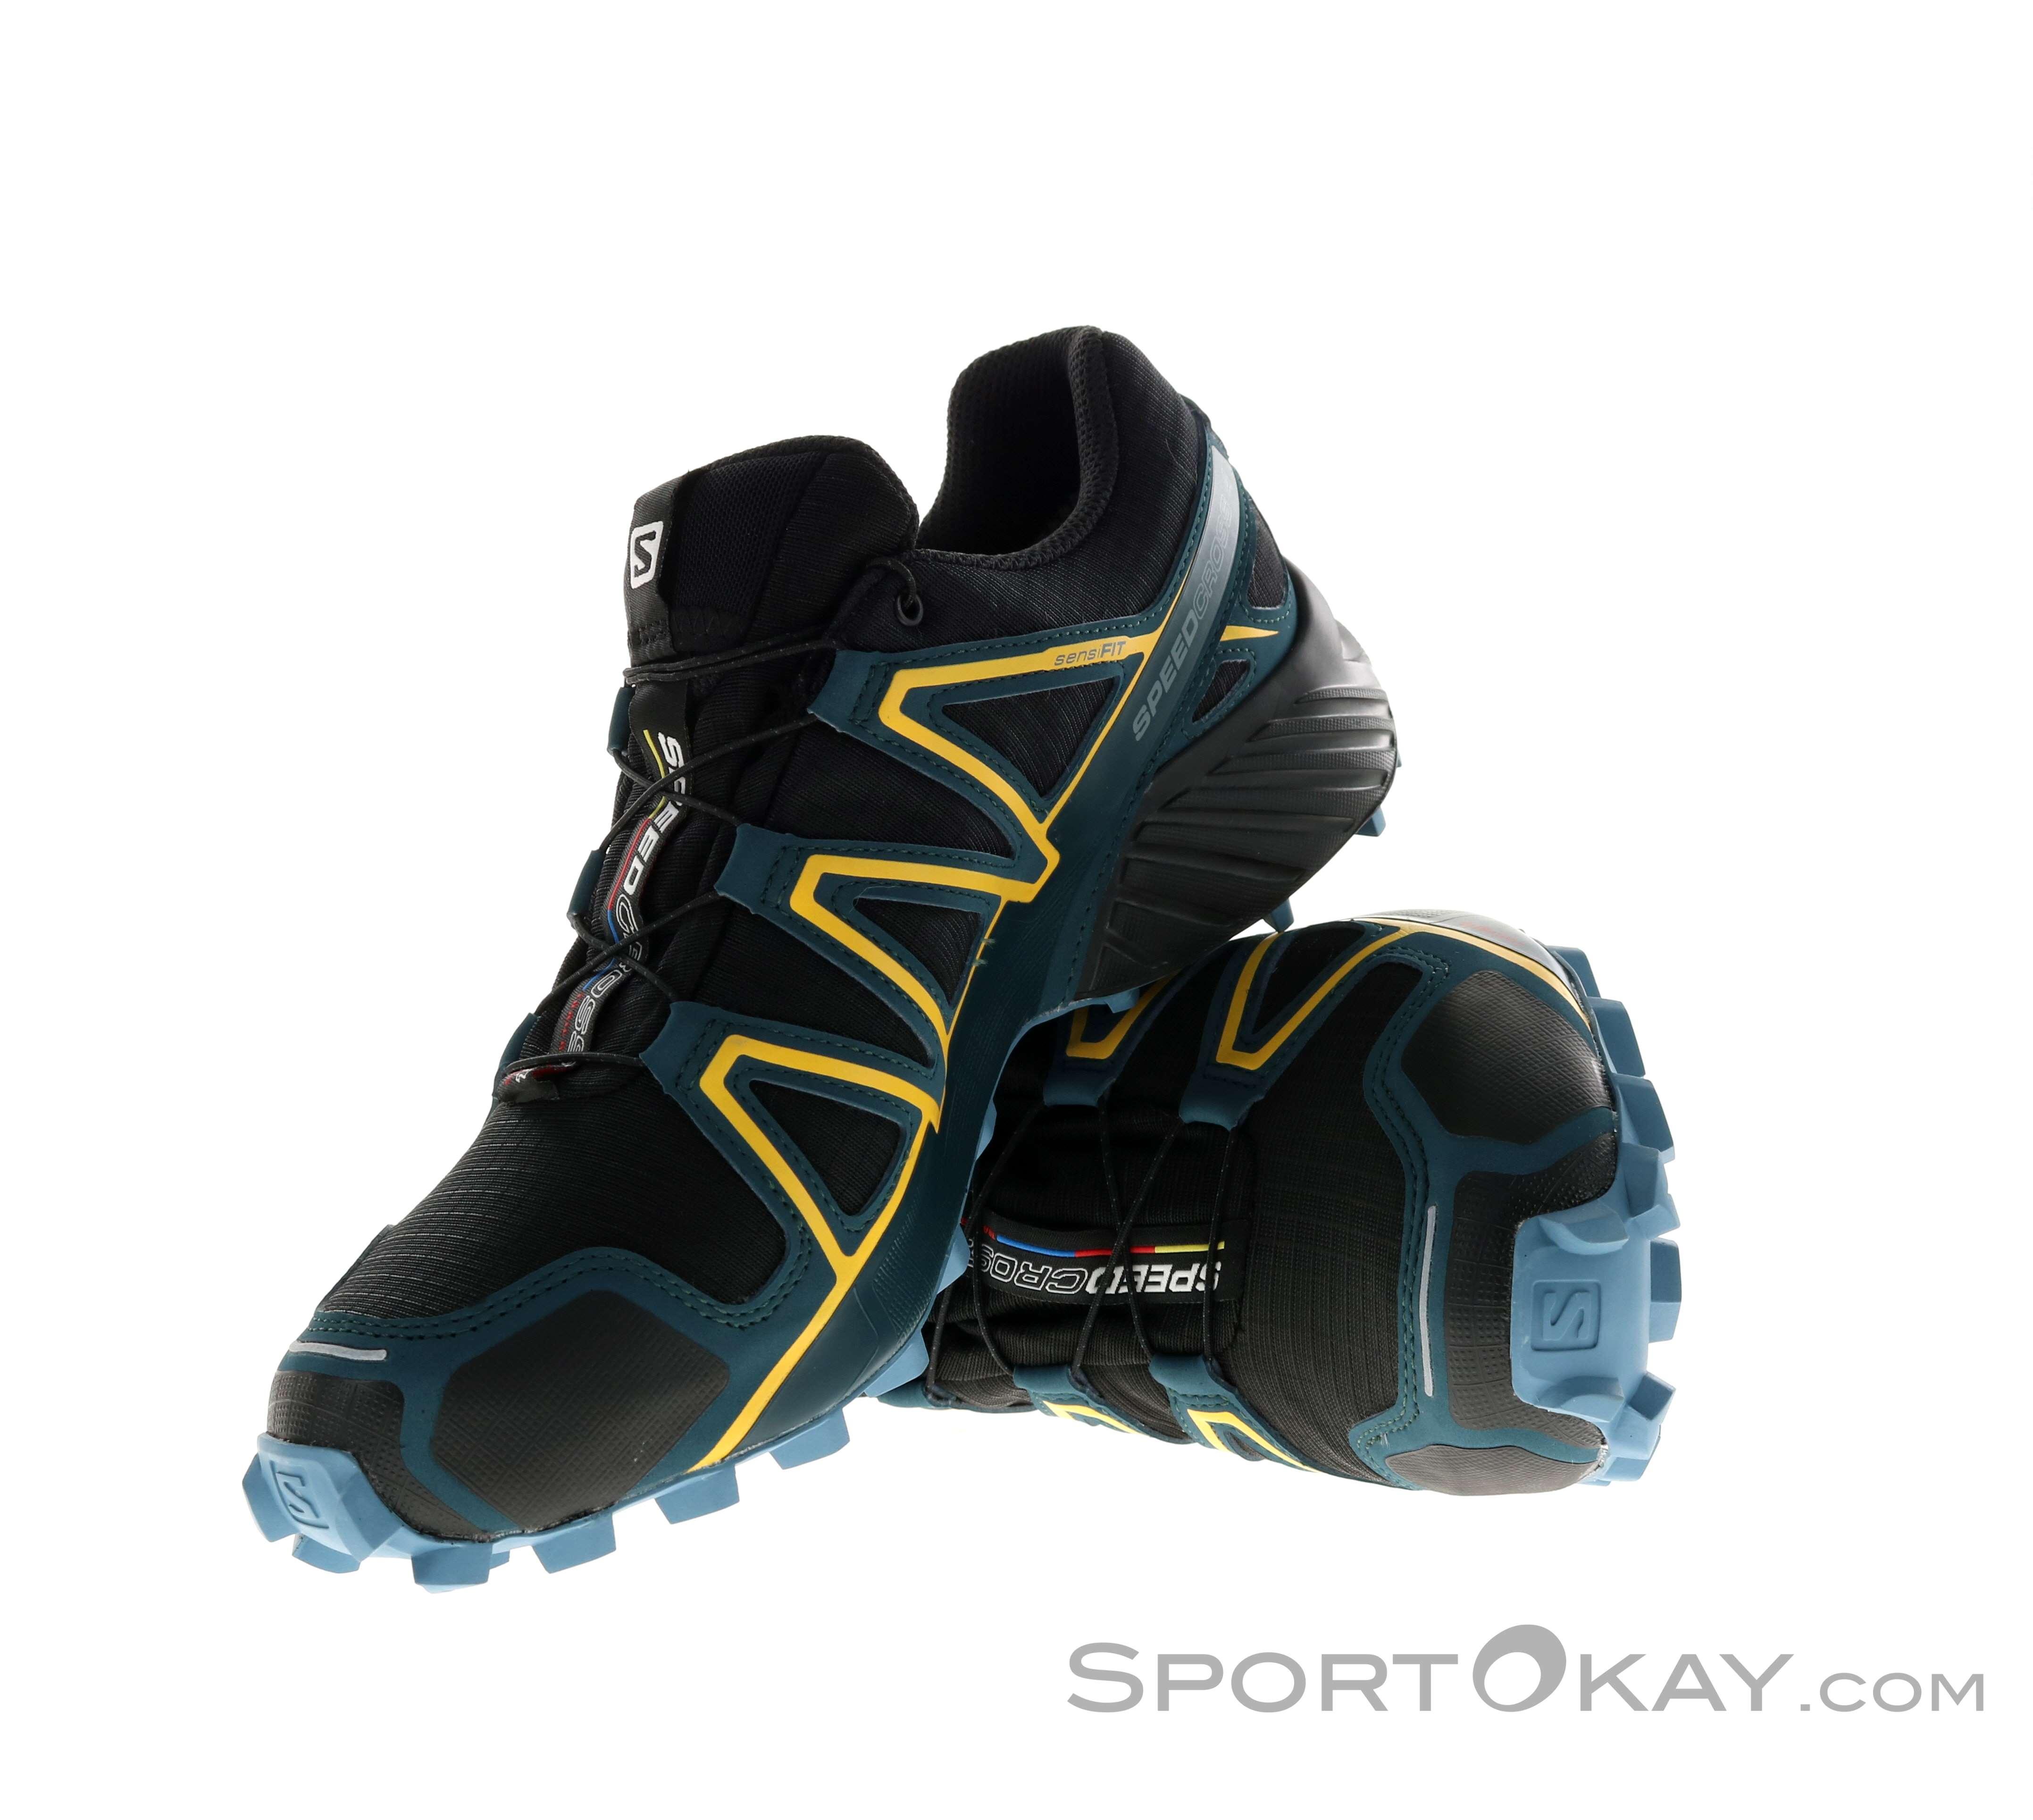 Salomon Speed ??Cross 4 Gore Tex Gtx hiking shoes men hiking shoes Trail Black